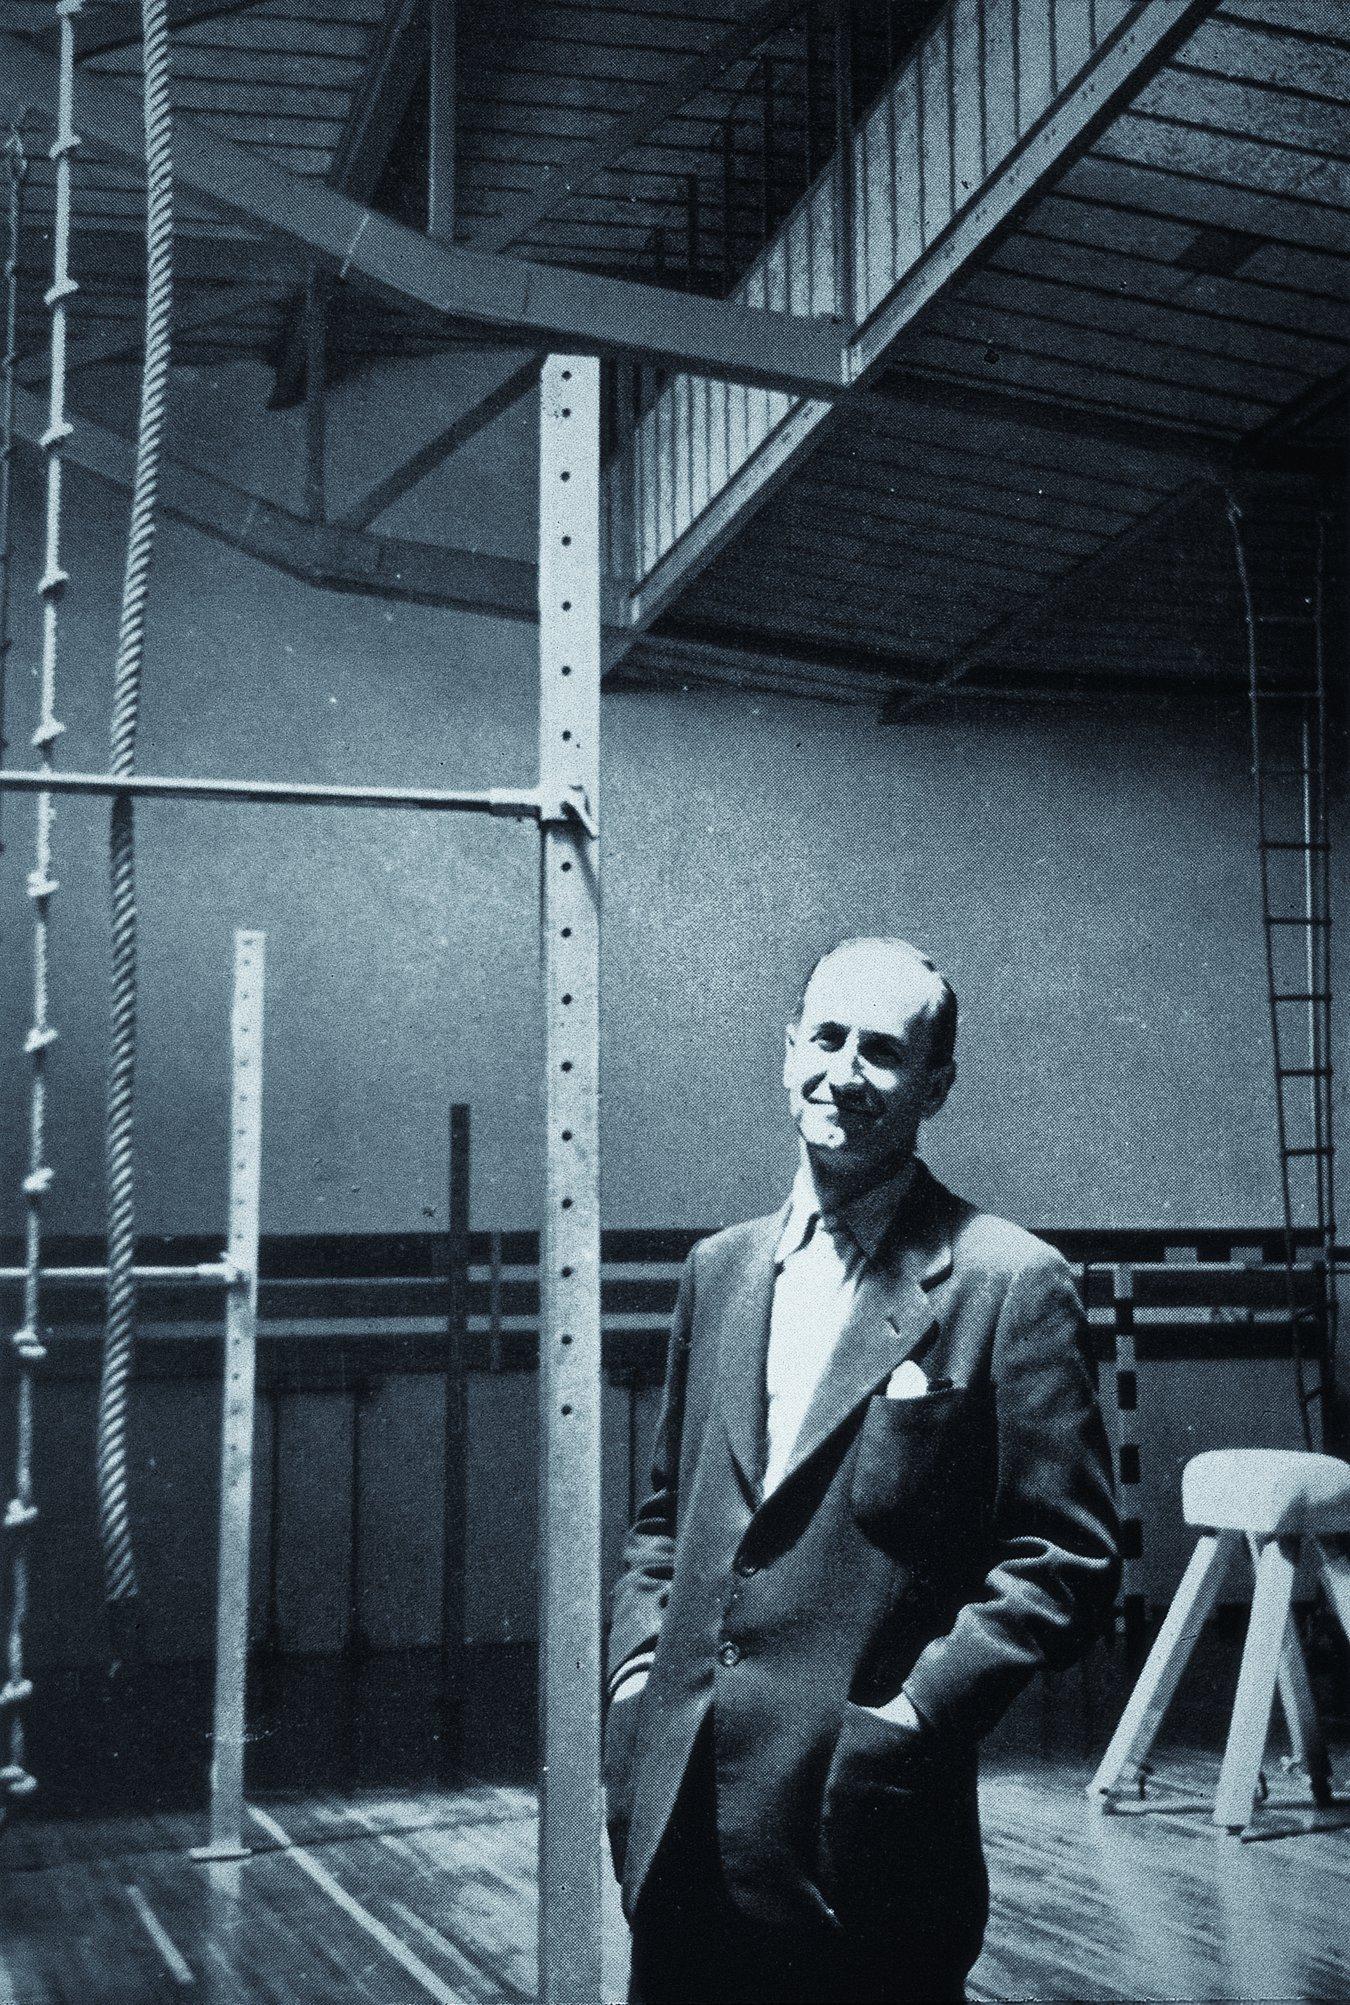 Galer a de cl sicos de arquitectura gimnasio maravillas for Gimnasio 19